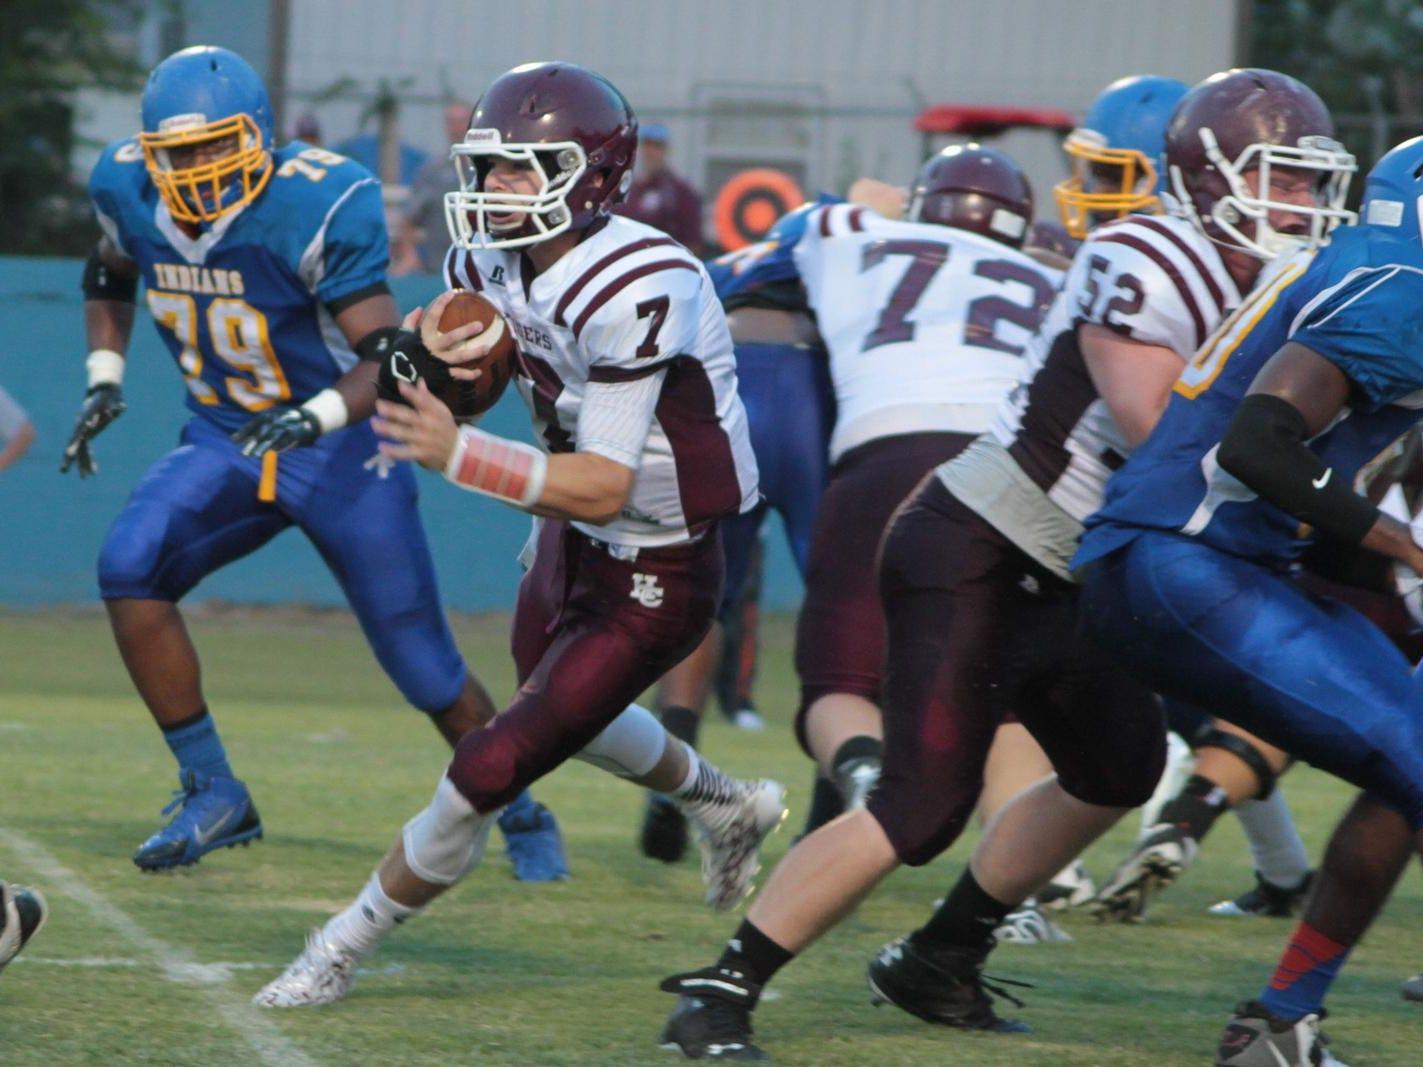 Hardin County quarterback runs the ball against North Side last season.